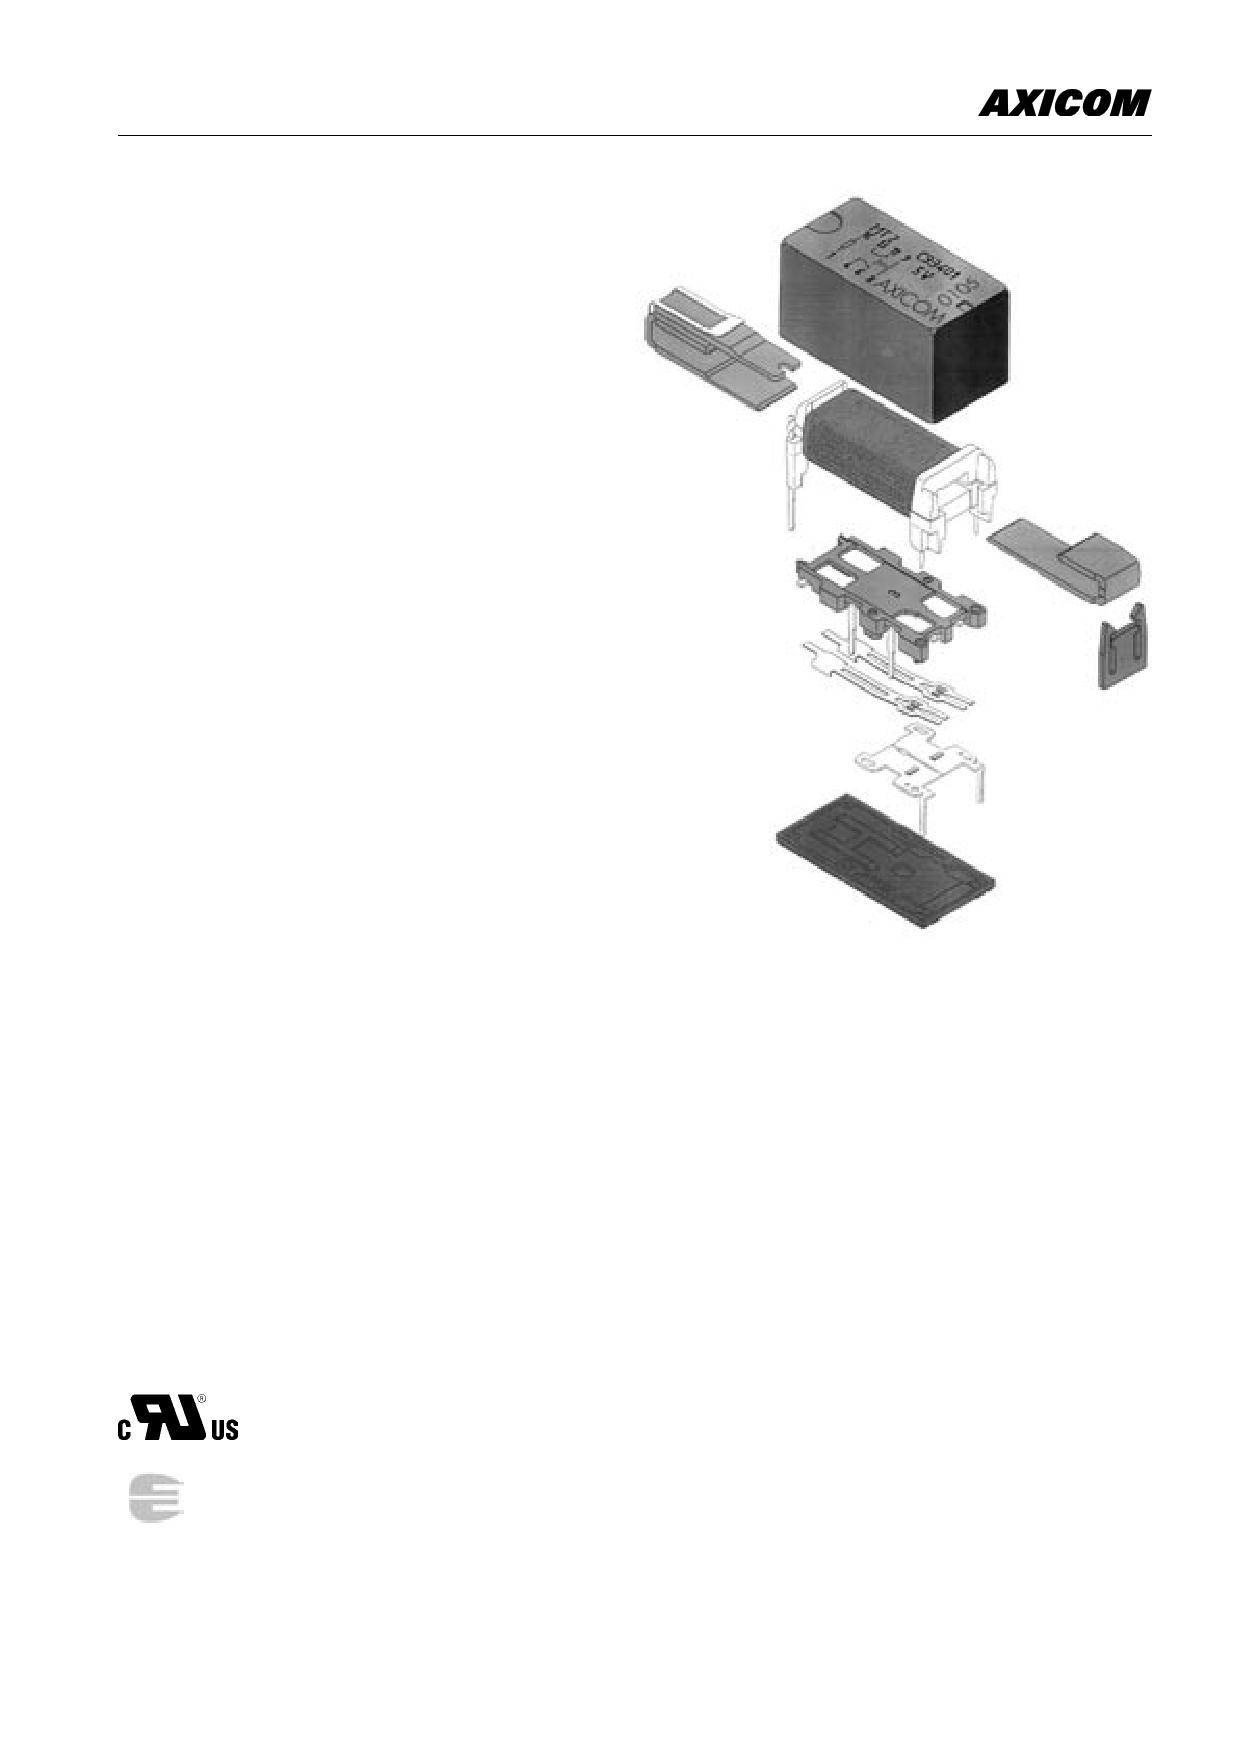 5-1462000-5 Даташит, Описание, Даташиты